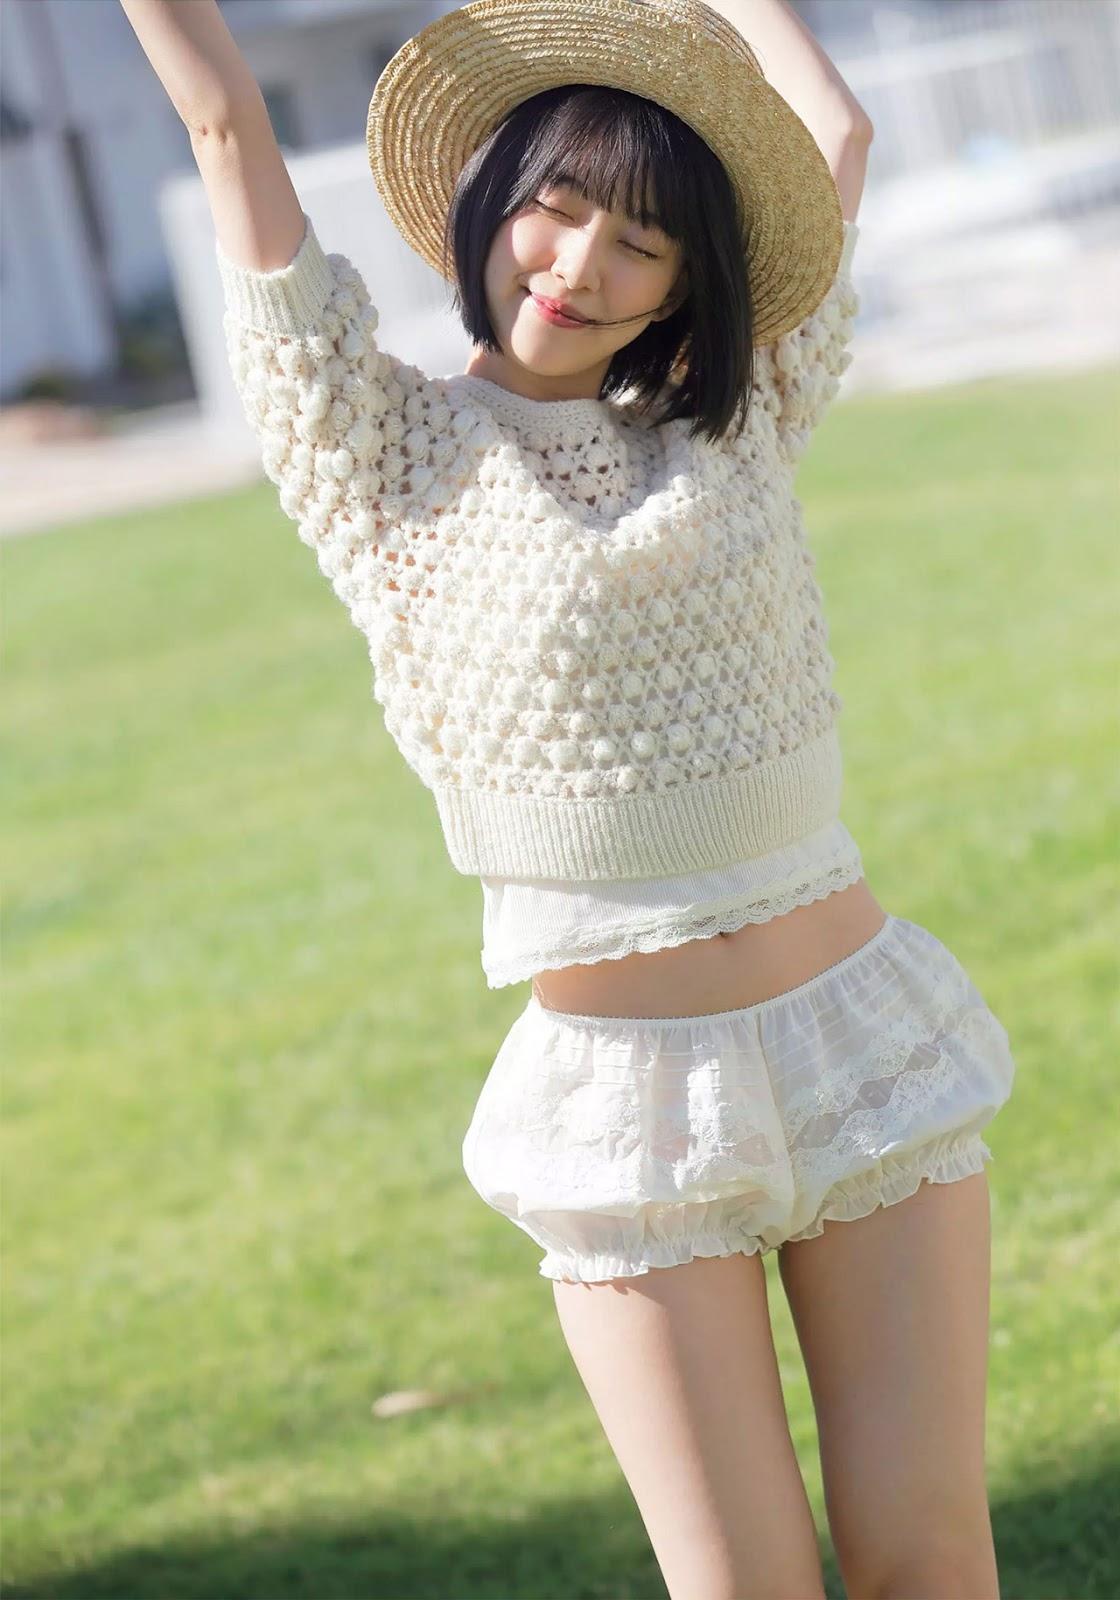 Nogizaka46 乃木坂46, FLASH 電子版 2018.01.02 (フラッシュ 2018年01月02日号)